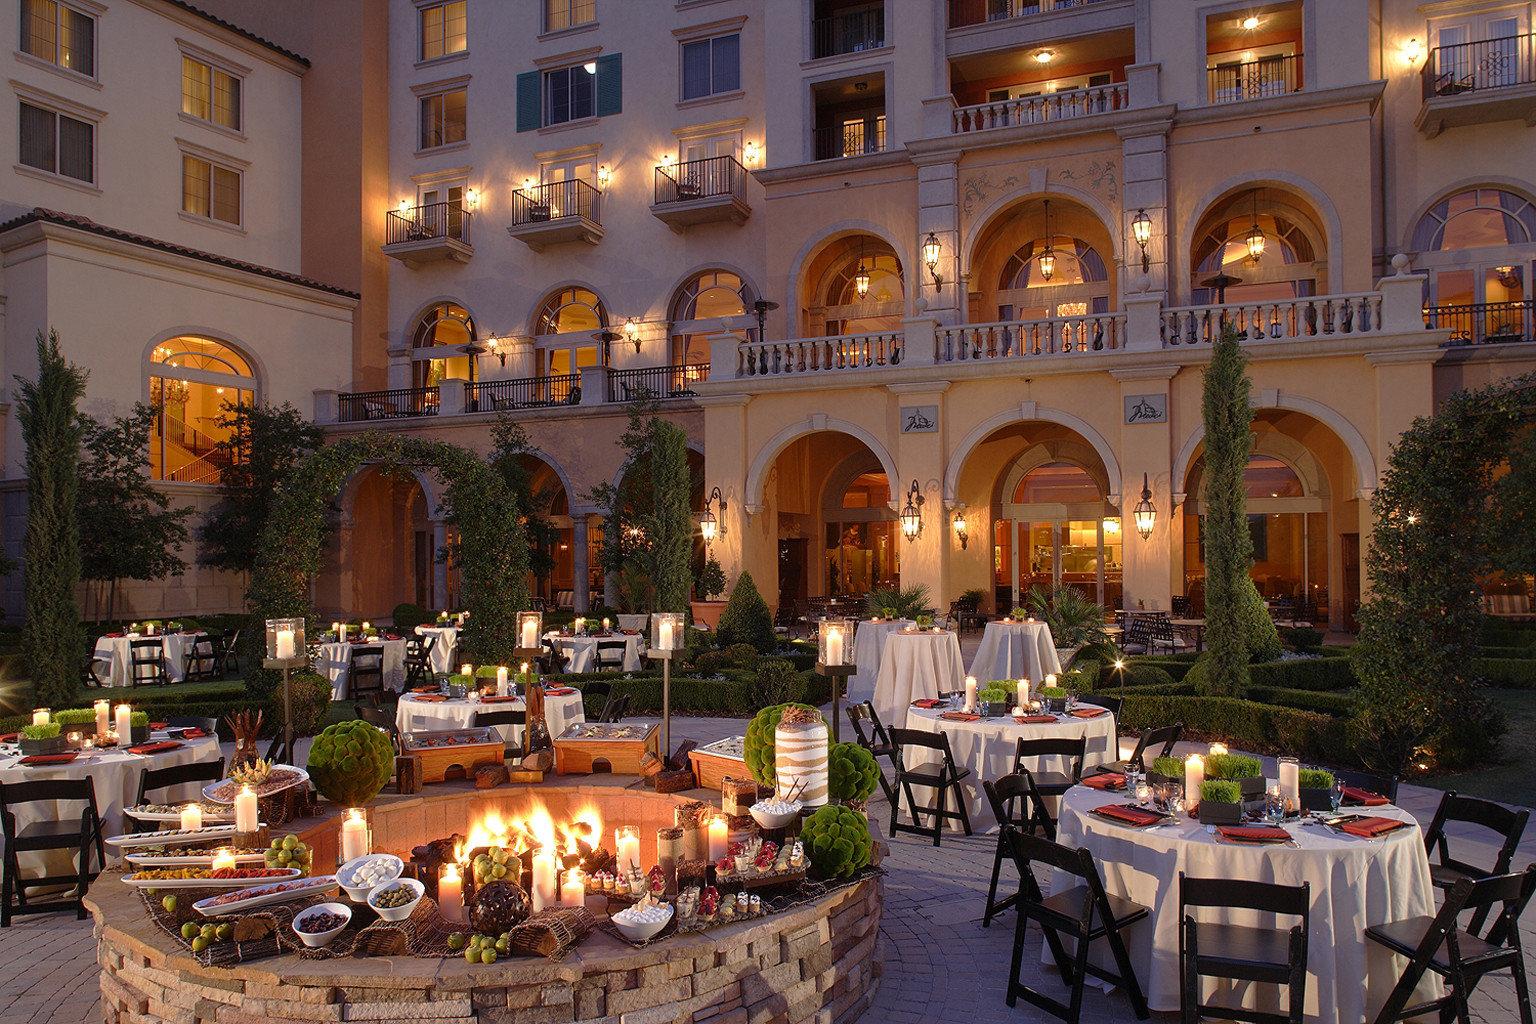 Dining Drink Eat Firepit Resort building palace